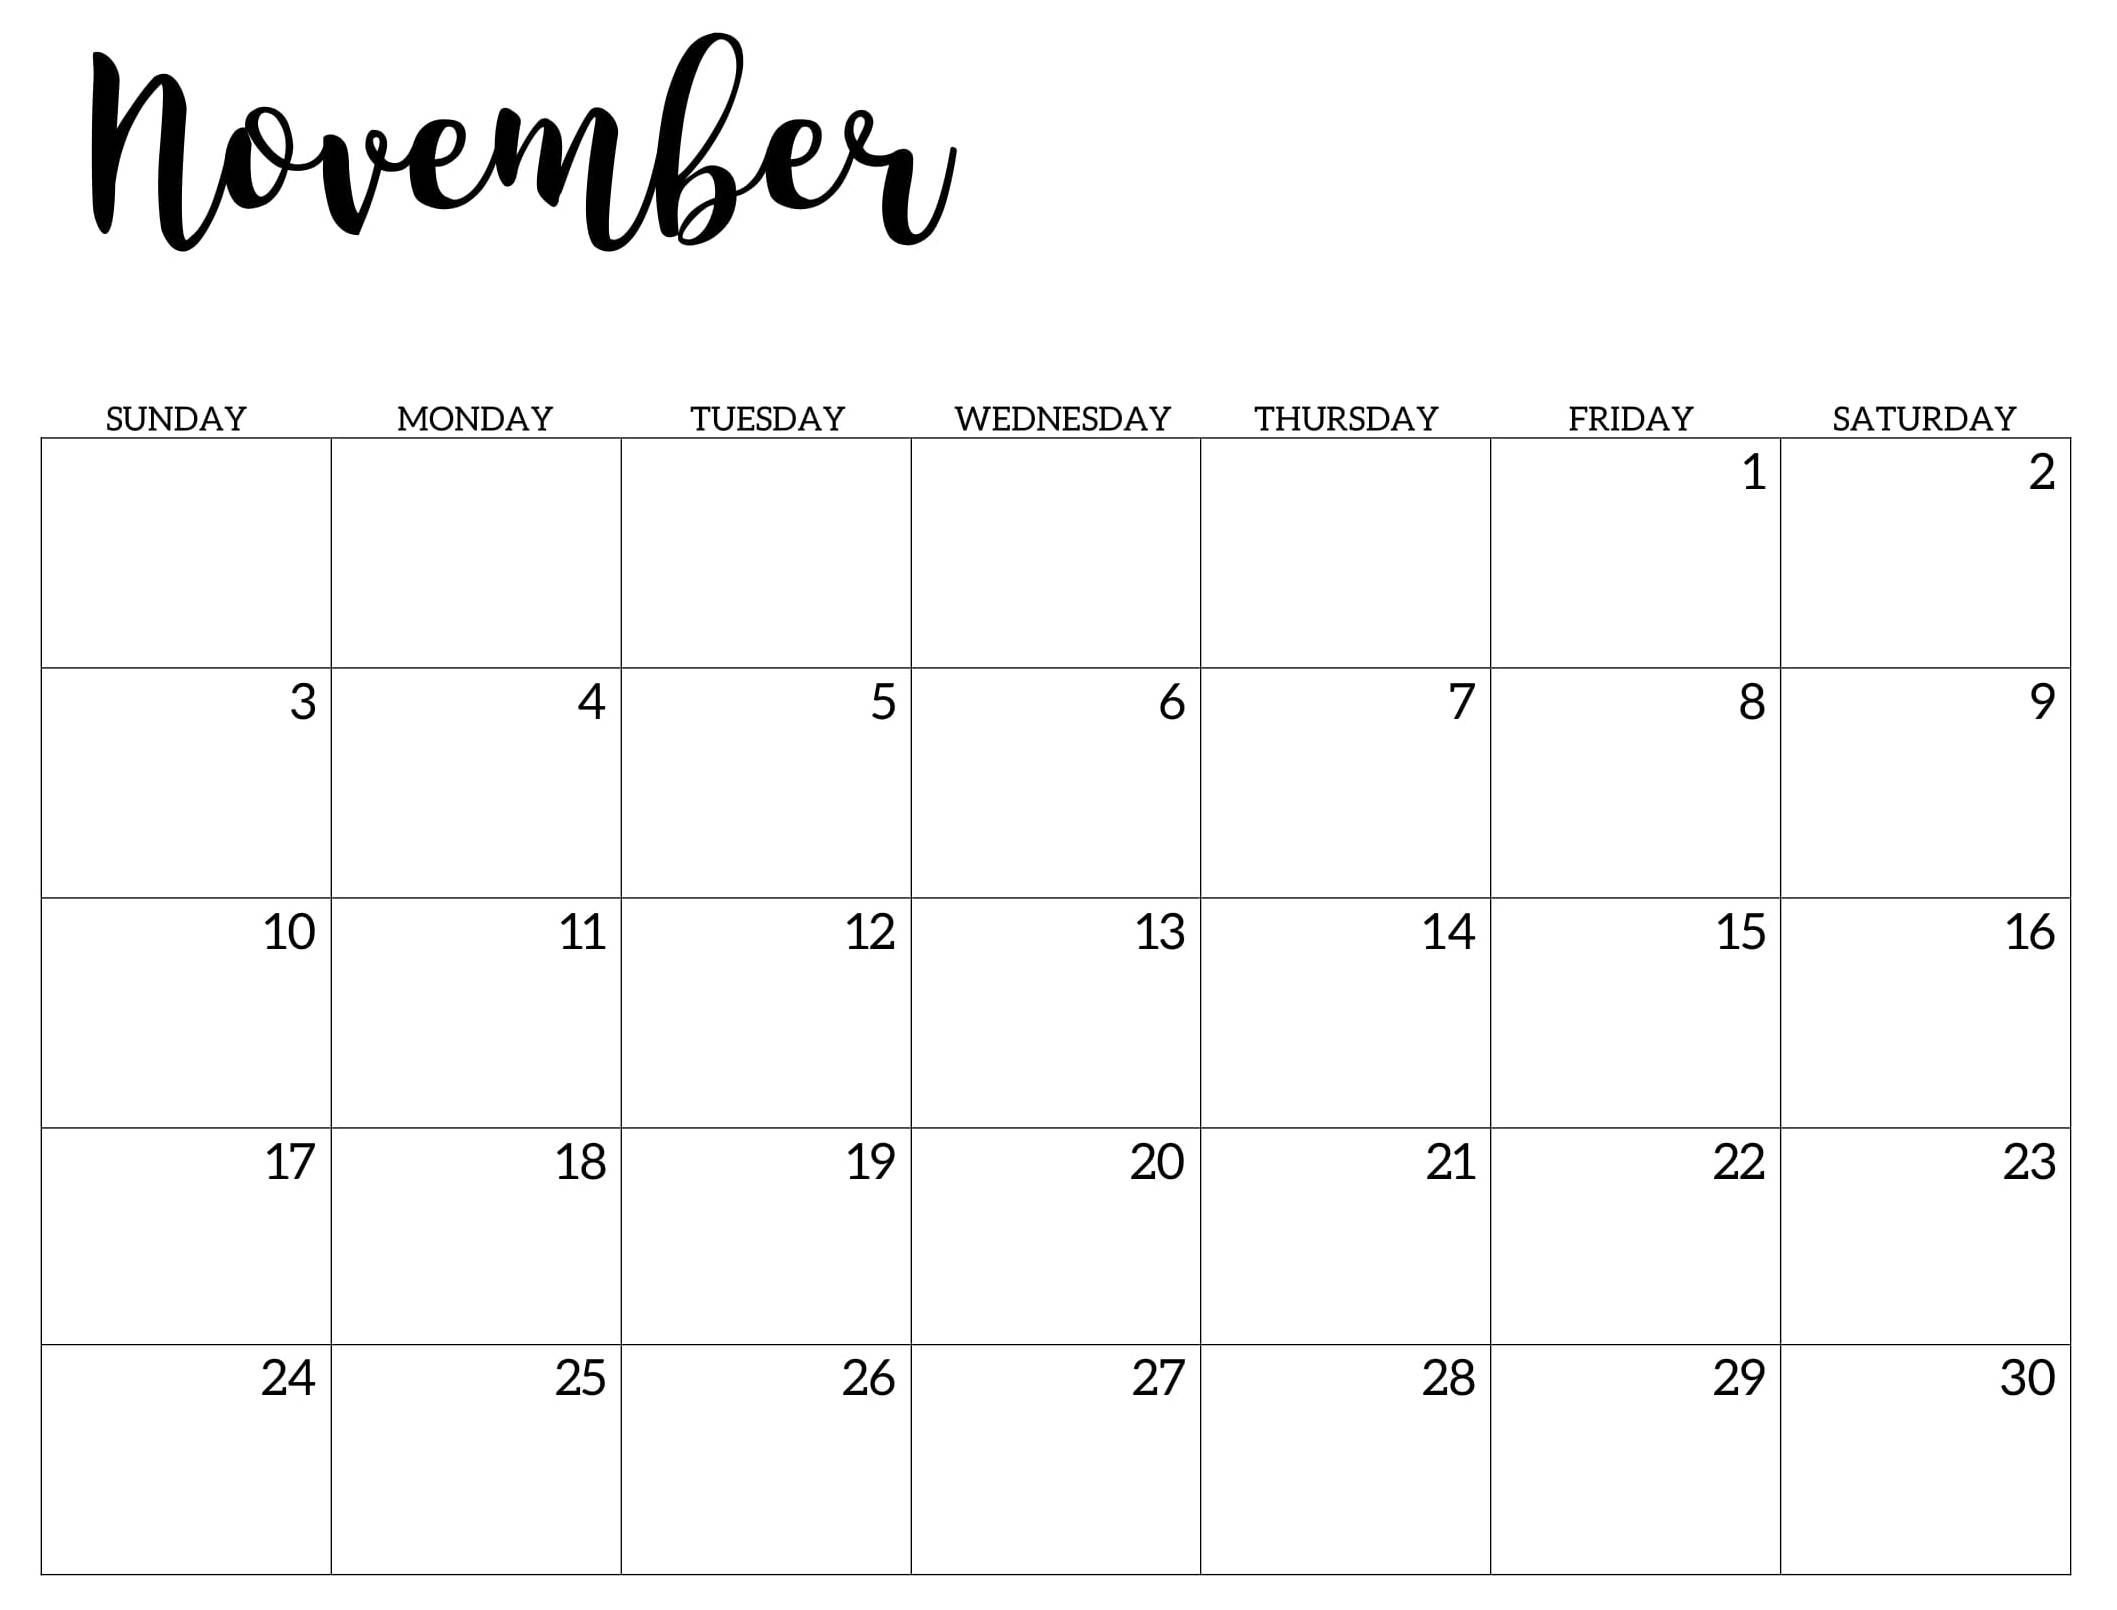 Calendar 2019 November Printable | November Printable Calendar, Print Calendar, Calendar Printables